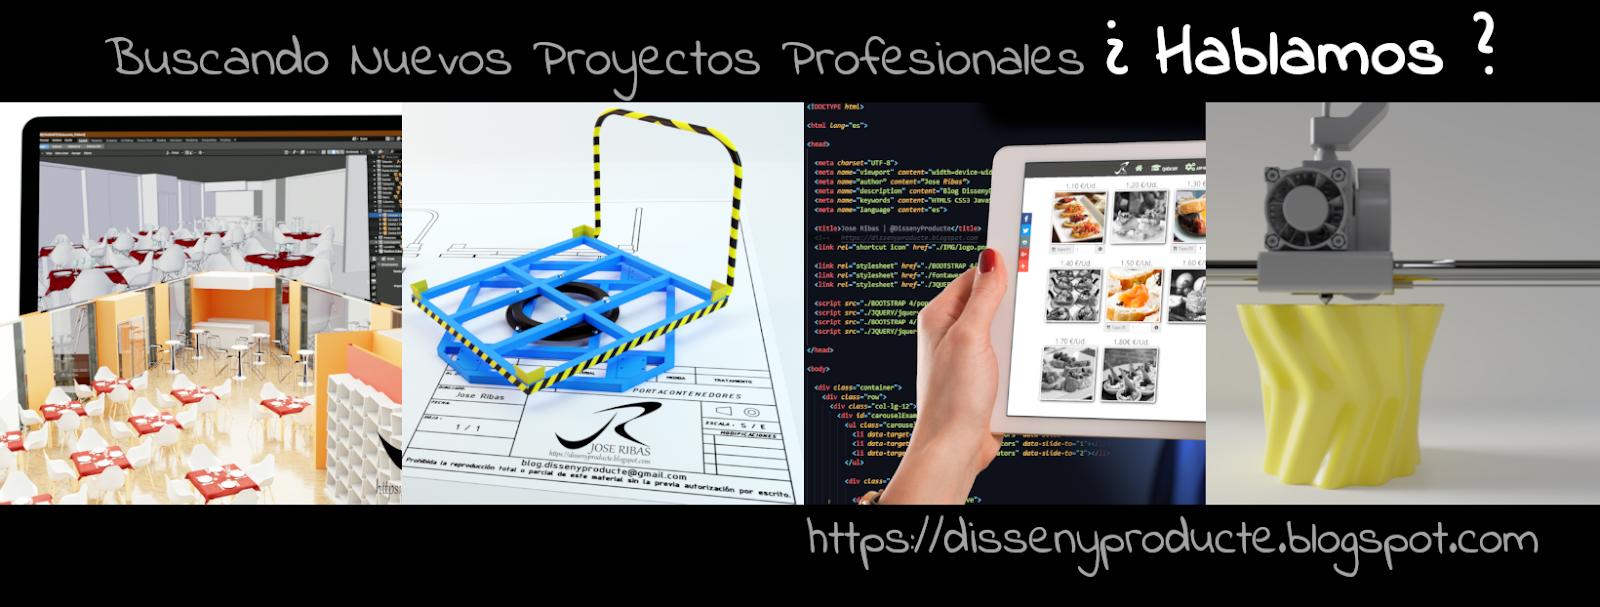 Jose Ribas | Blog Disseny Producte